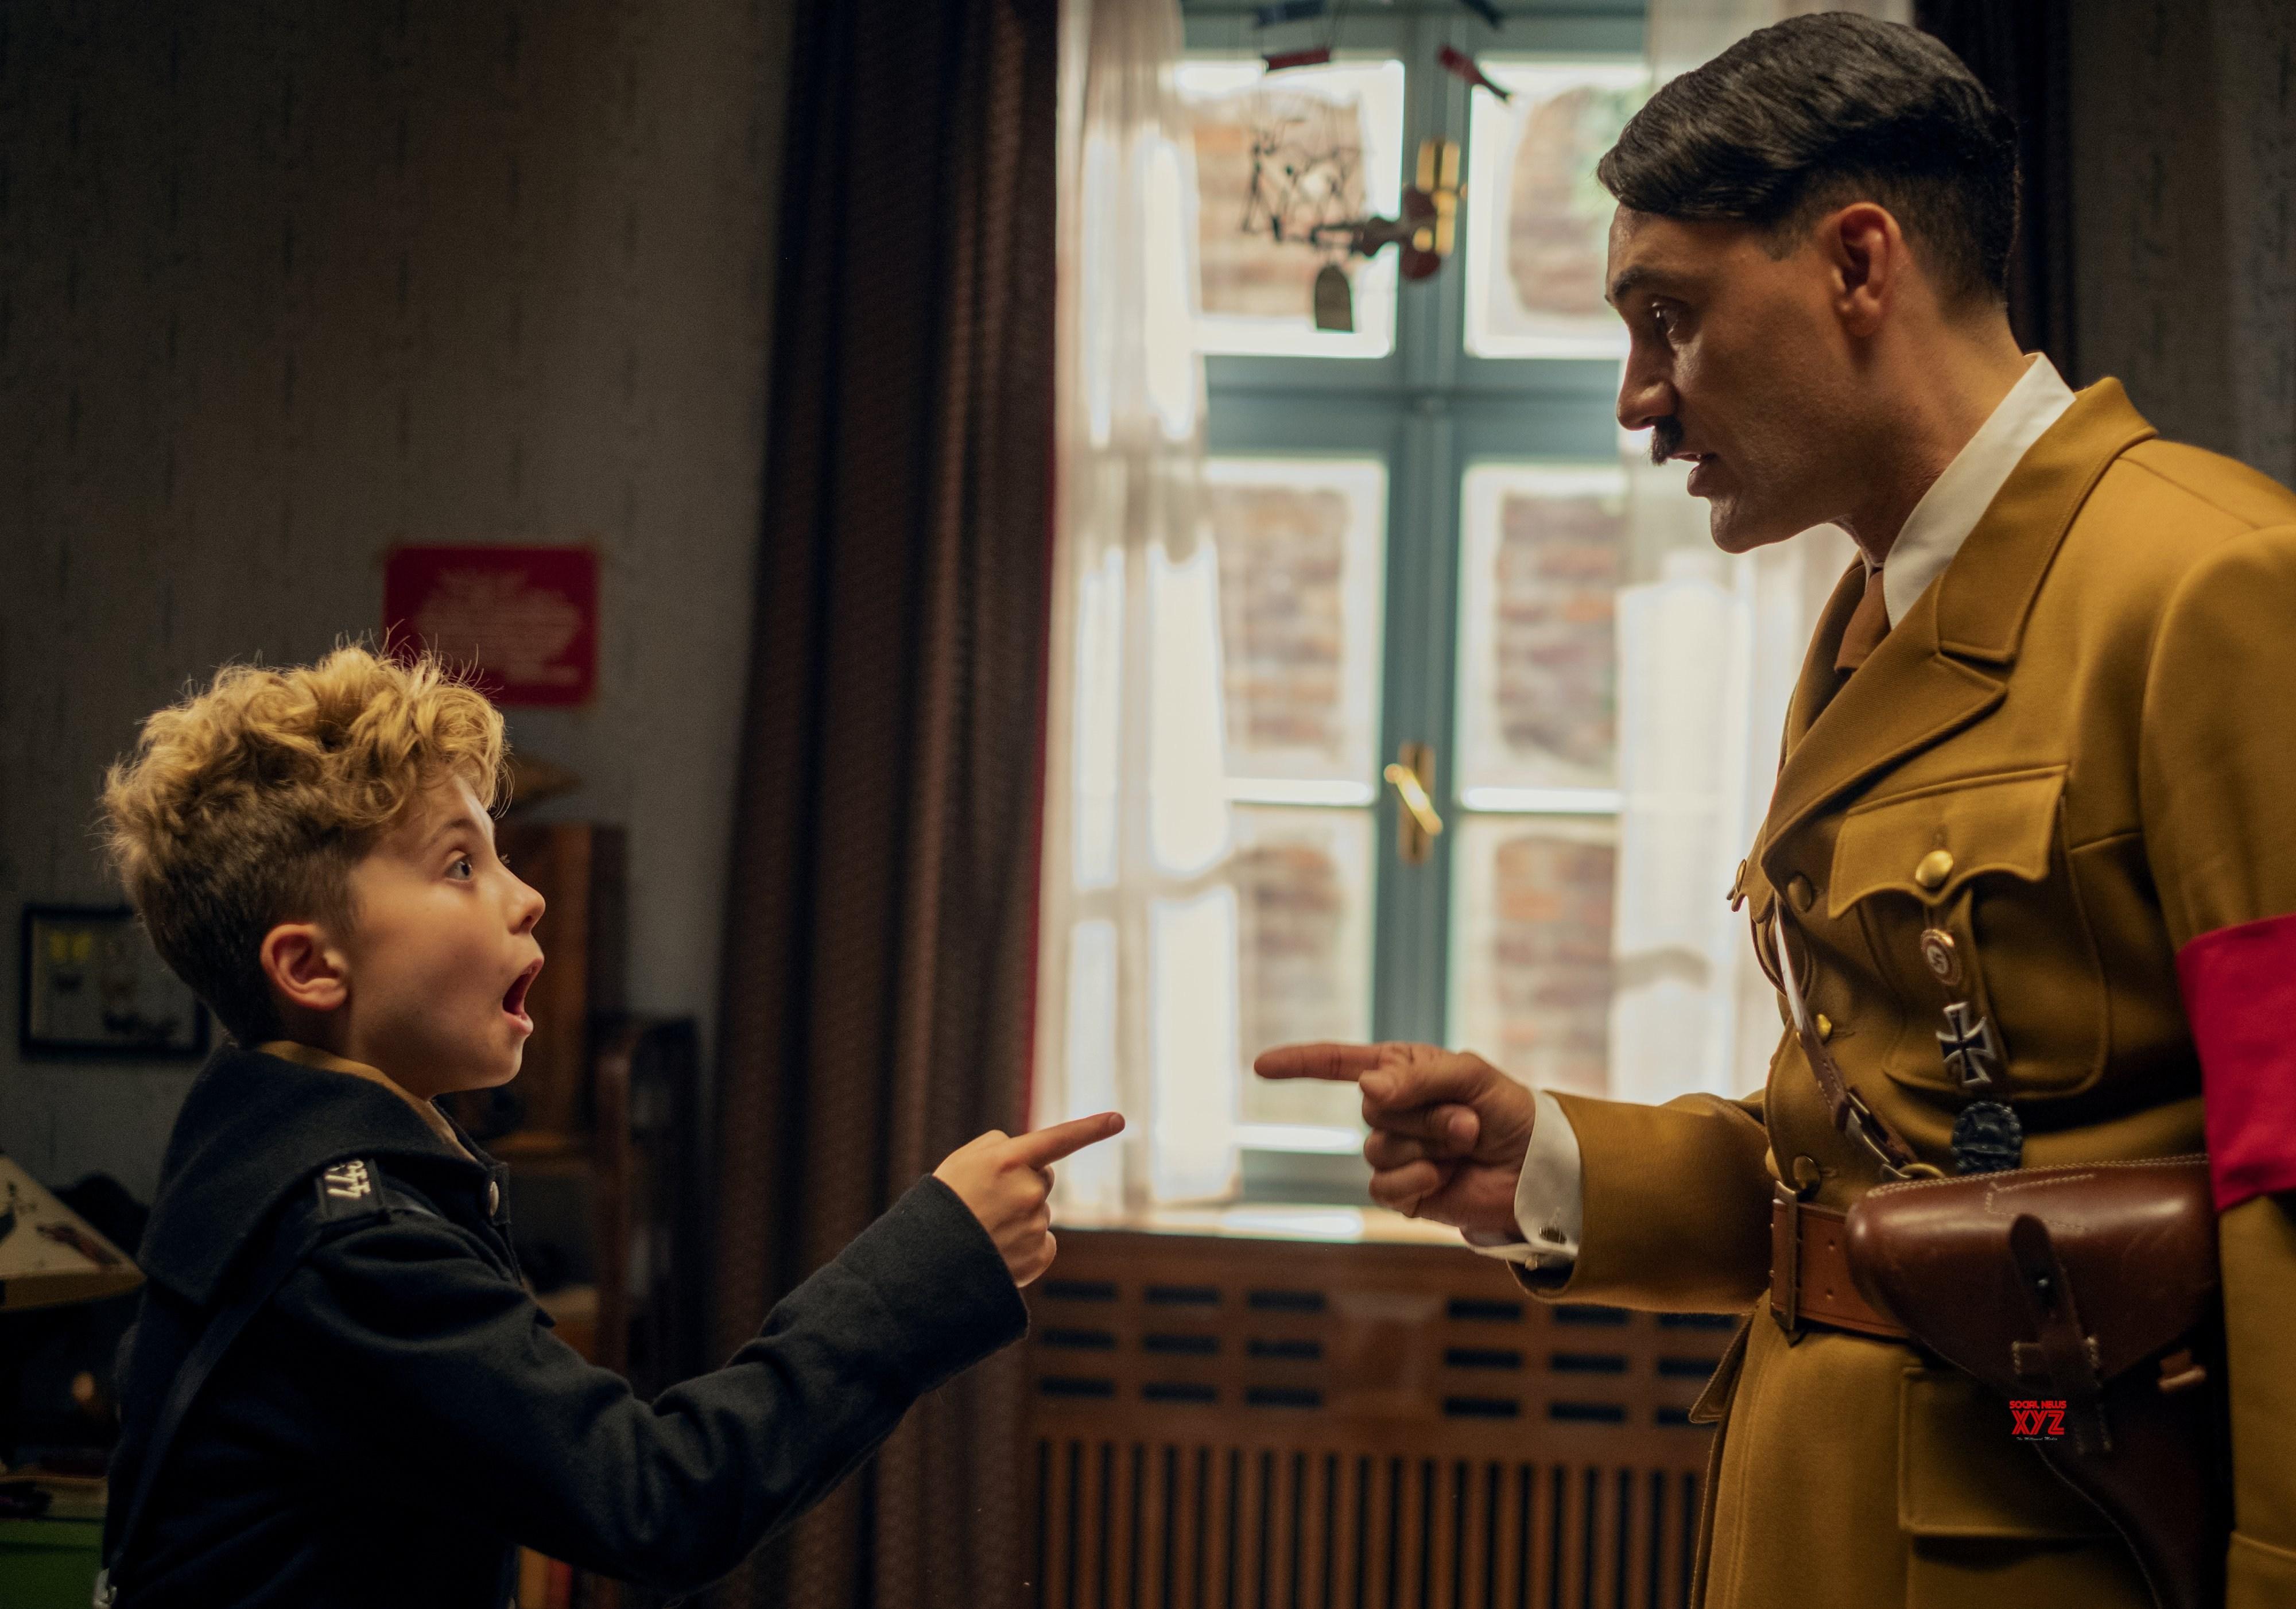 Jojo (Roman Griffin Davis) and Adolph Hitler (Taika Waititi) point at each other.